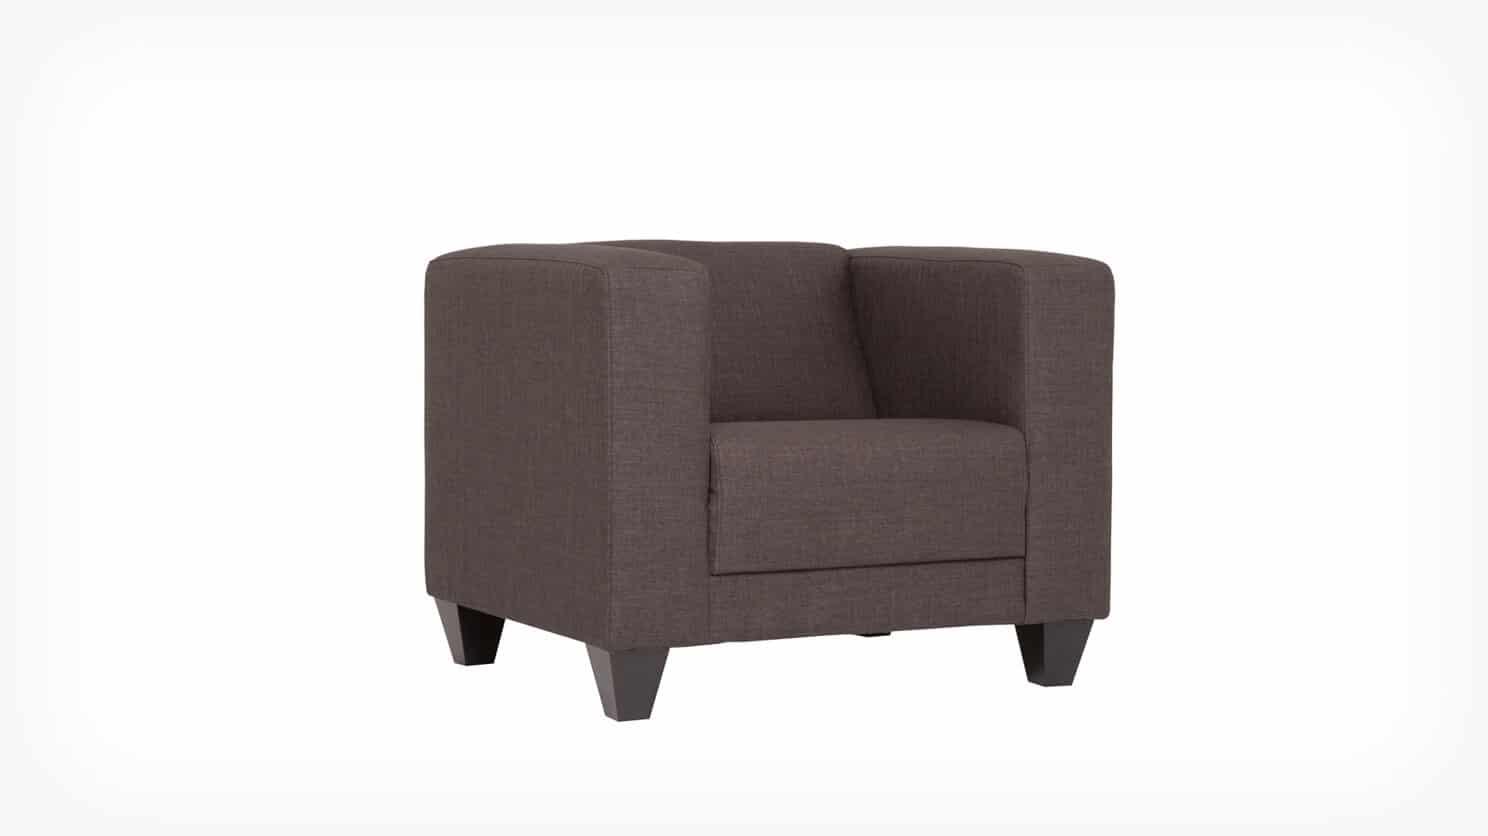 30042 02 2 chairs stella chair polo slate corner